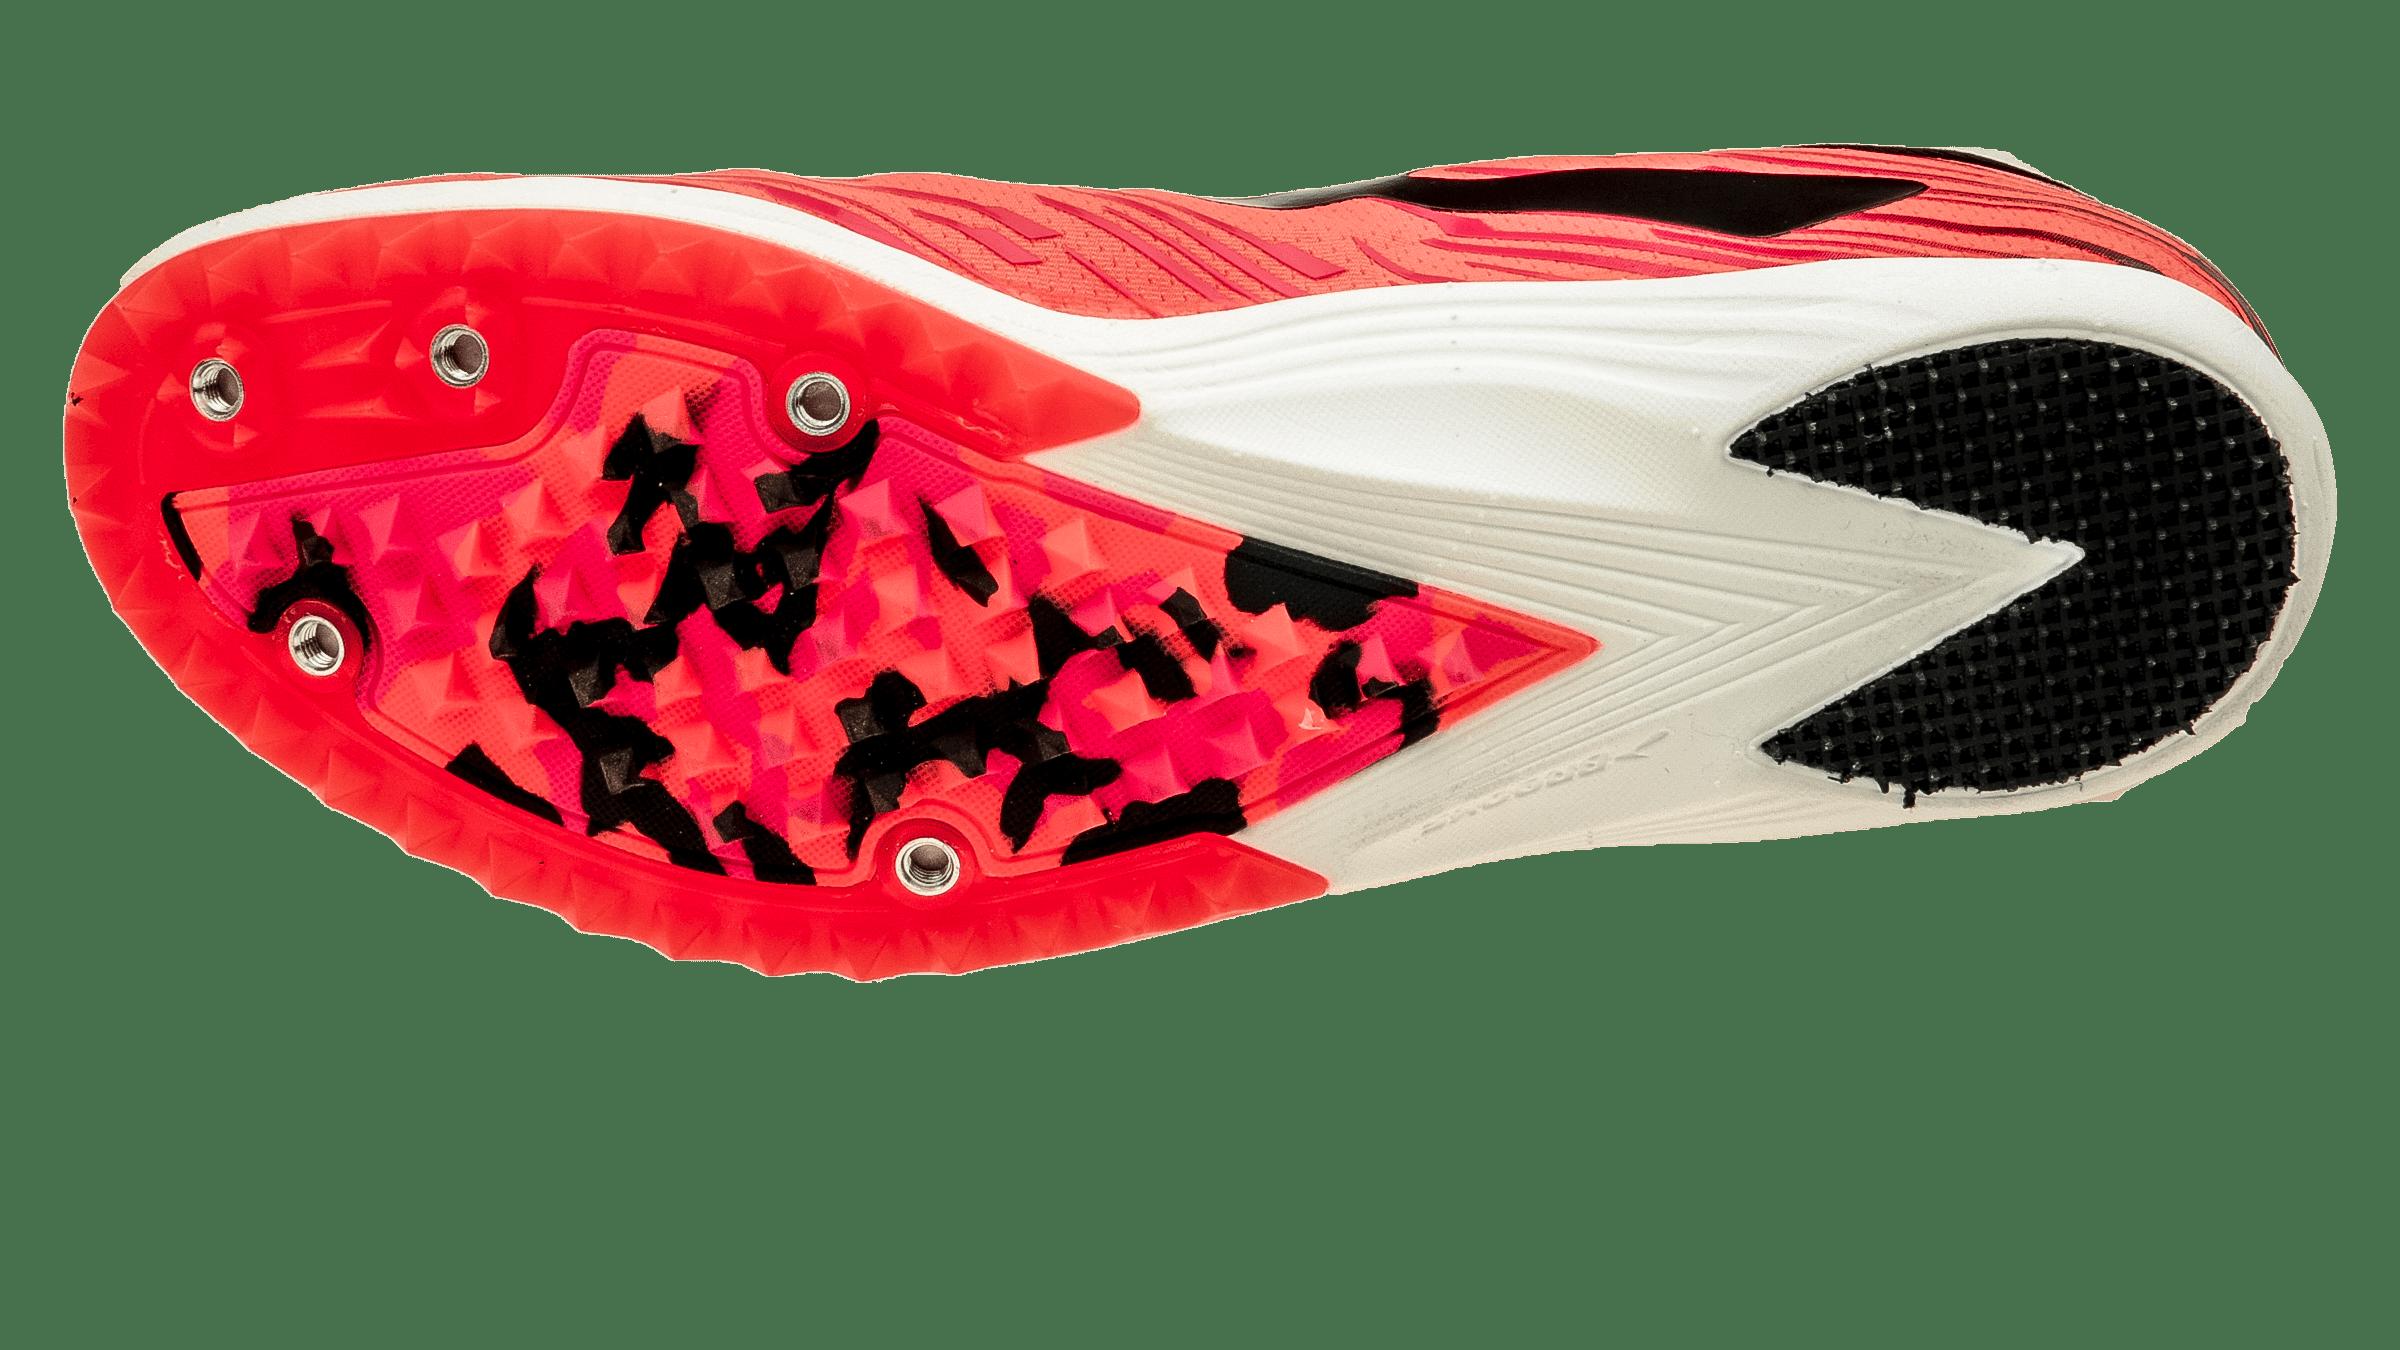 967def5adaf Brooks Men's Mach 18 orange/pink/black bestellen bij Koole Sport Lab